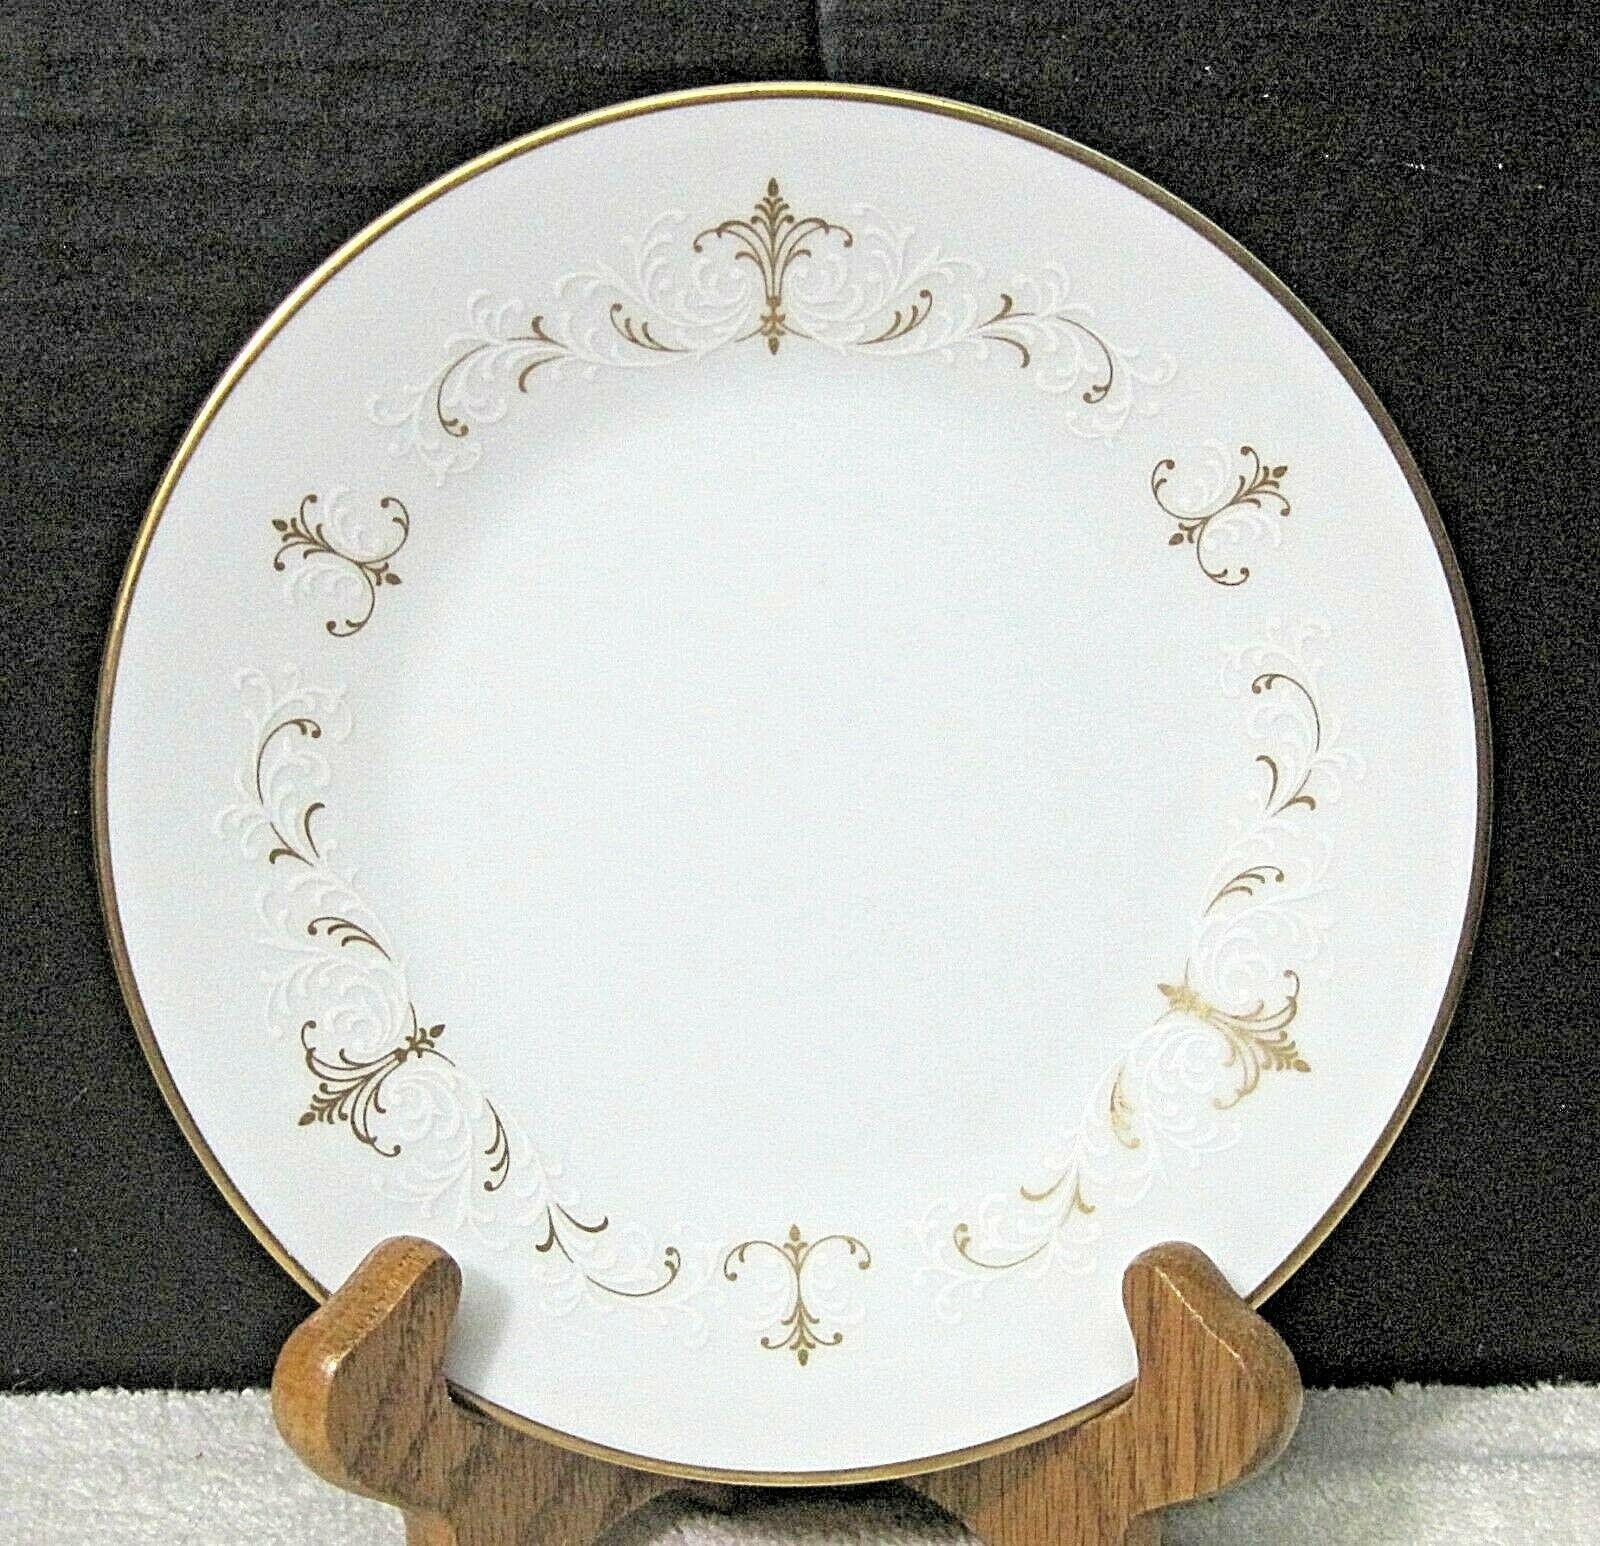 Noritake Courtney #6520 1964-1980 Gold White Scroll Bread Butter Cake Plate 1PC  - $7.92